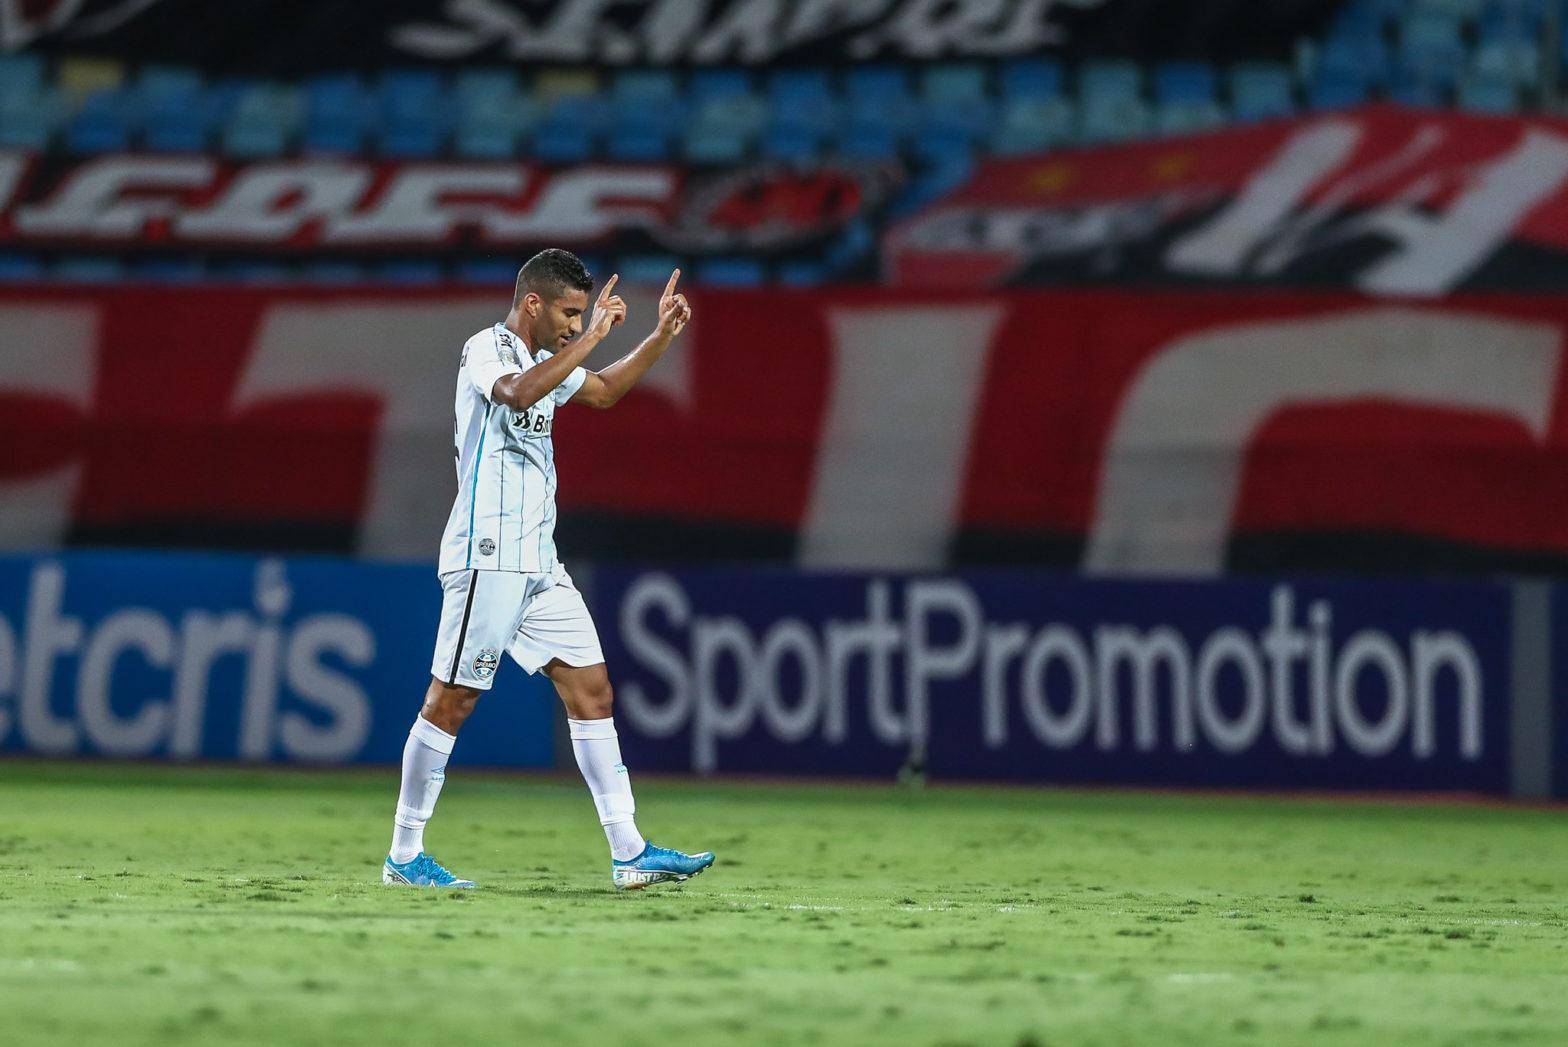 Nem Cavani salvaria o Grêmio